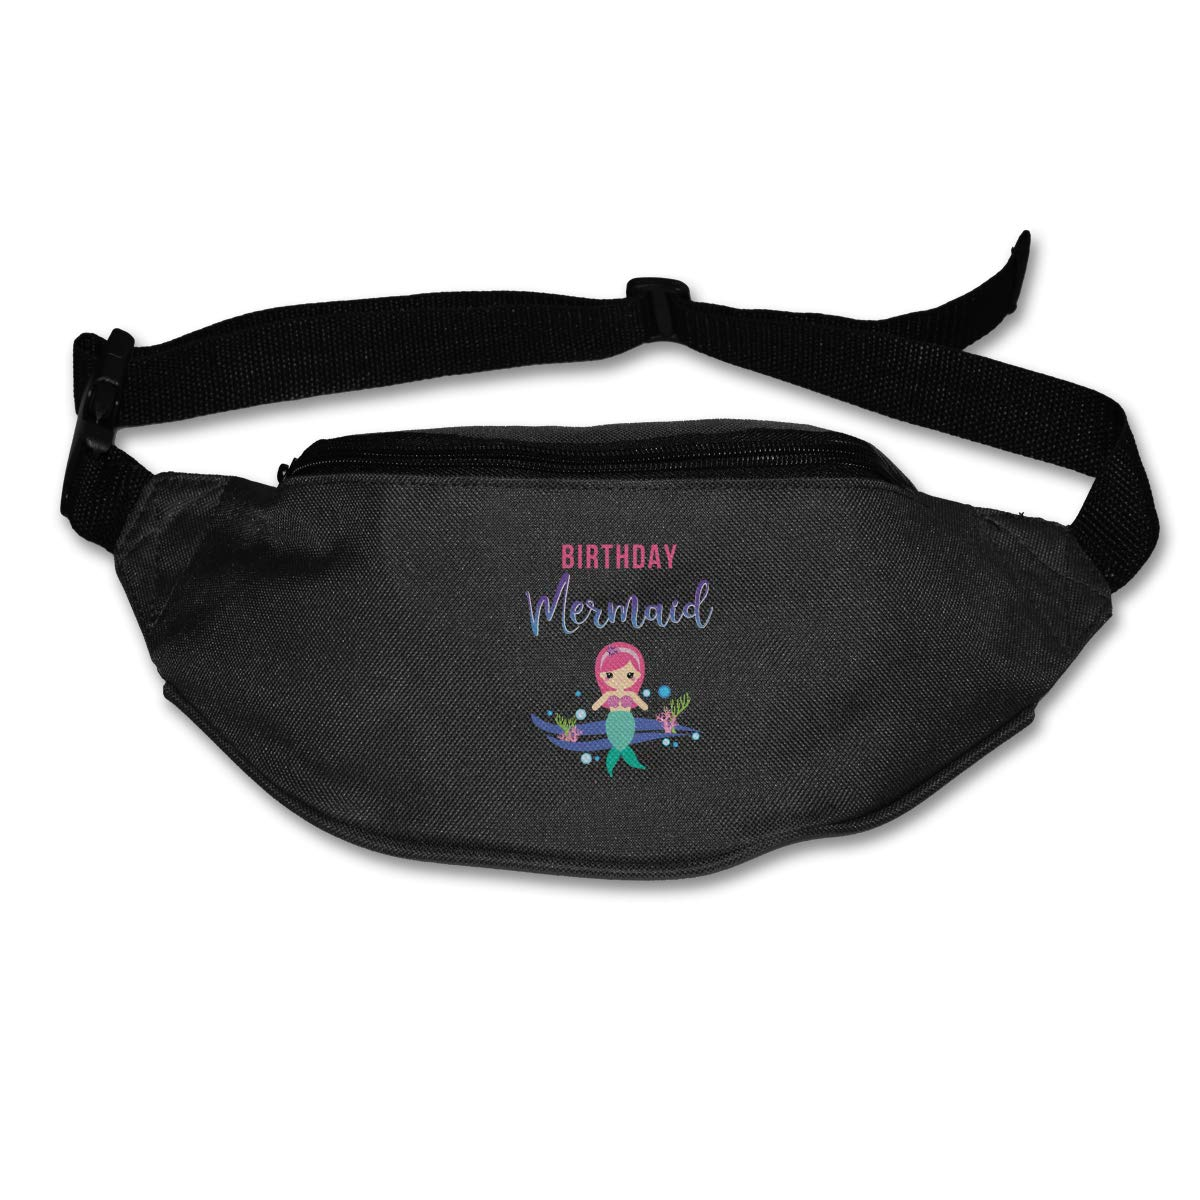 Cute Mermaid Birthday Sport Waist Bag Fanny Pack Adjustable For Travel